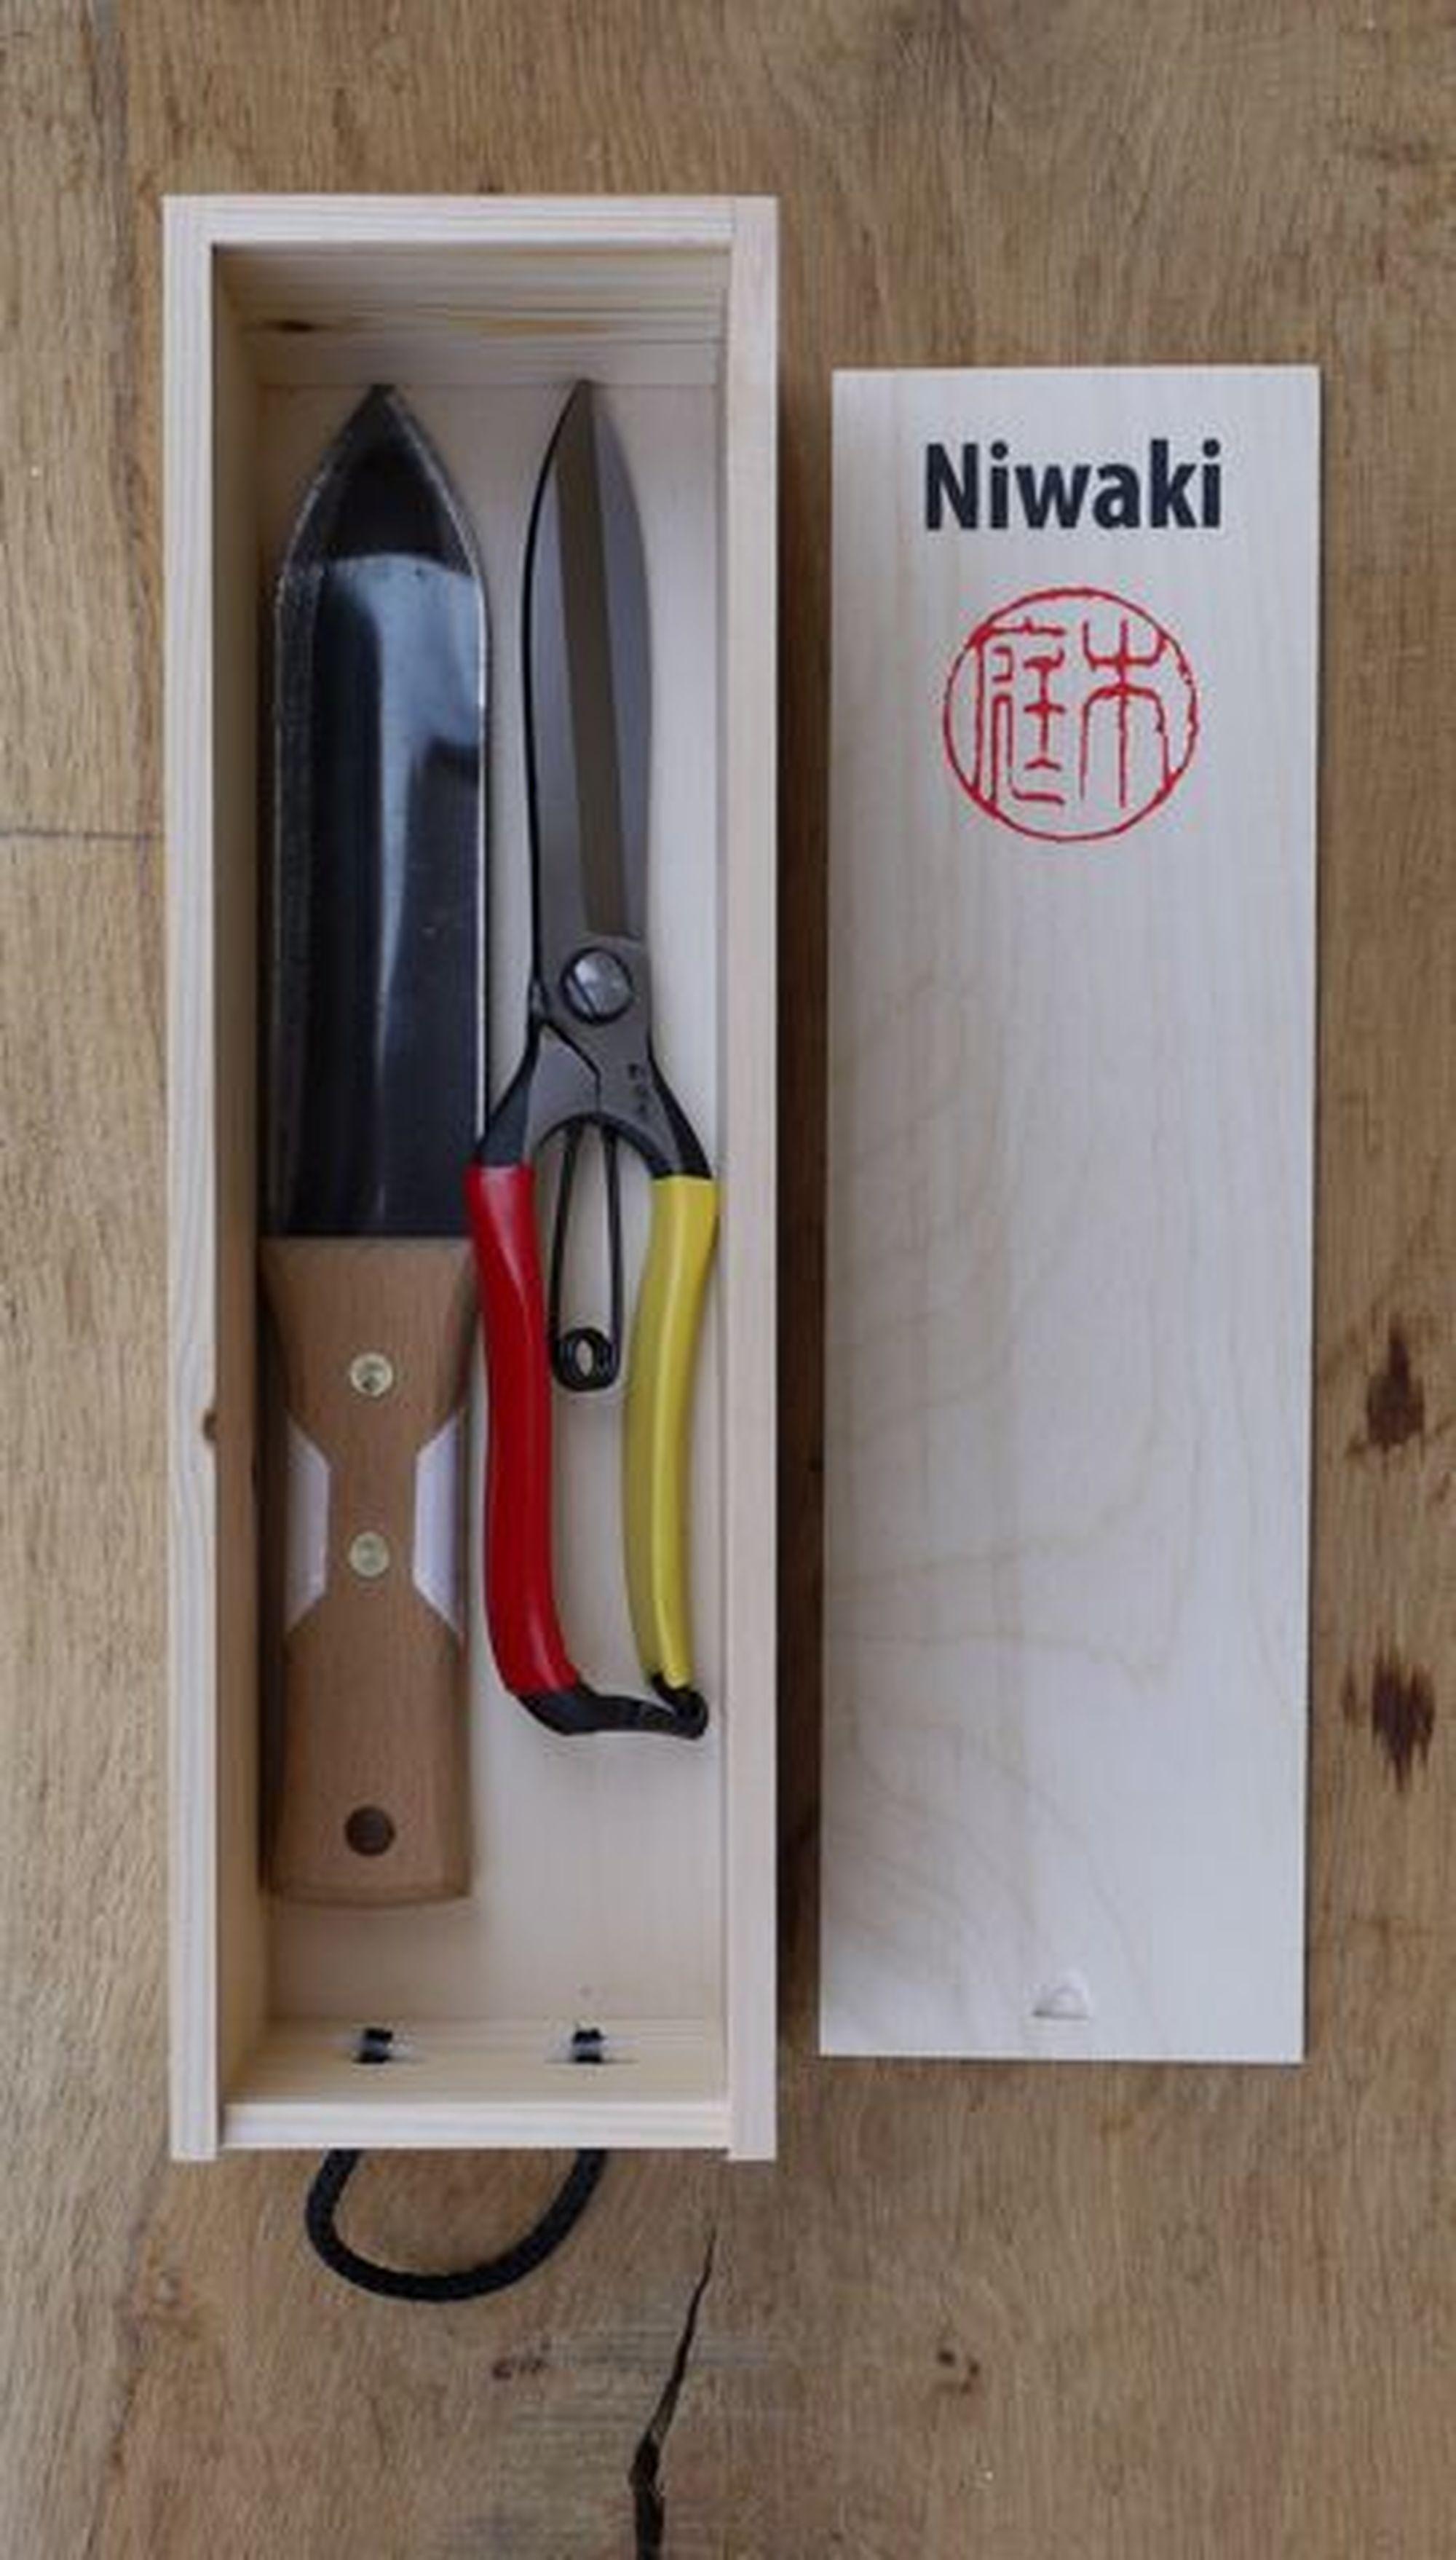 niwaki wine box